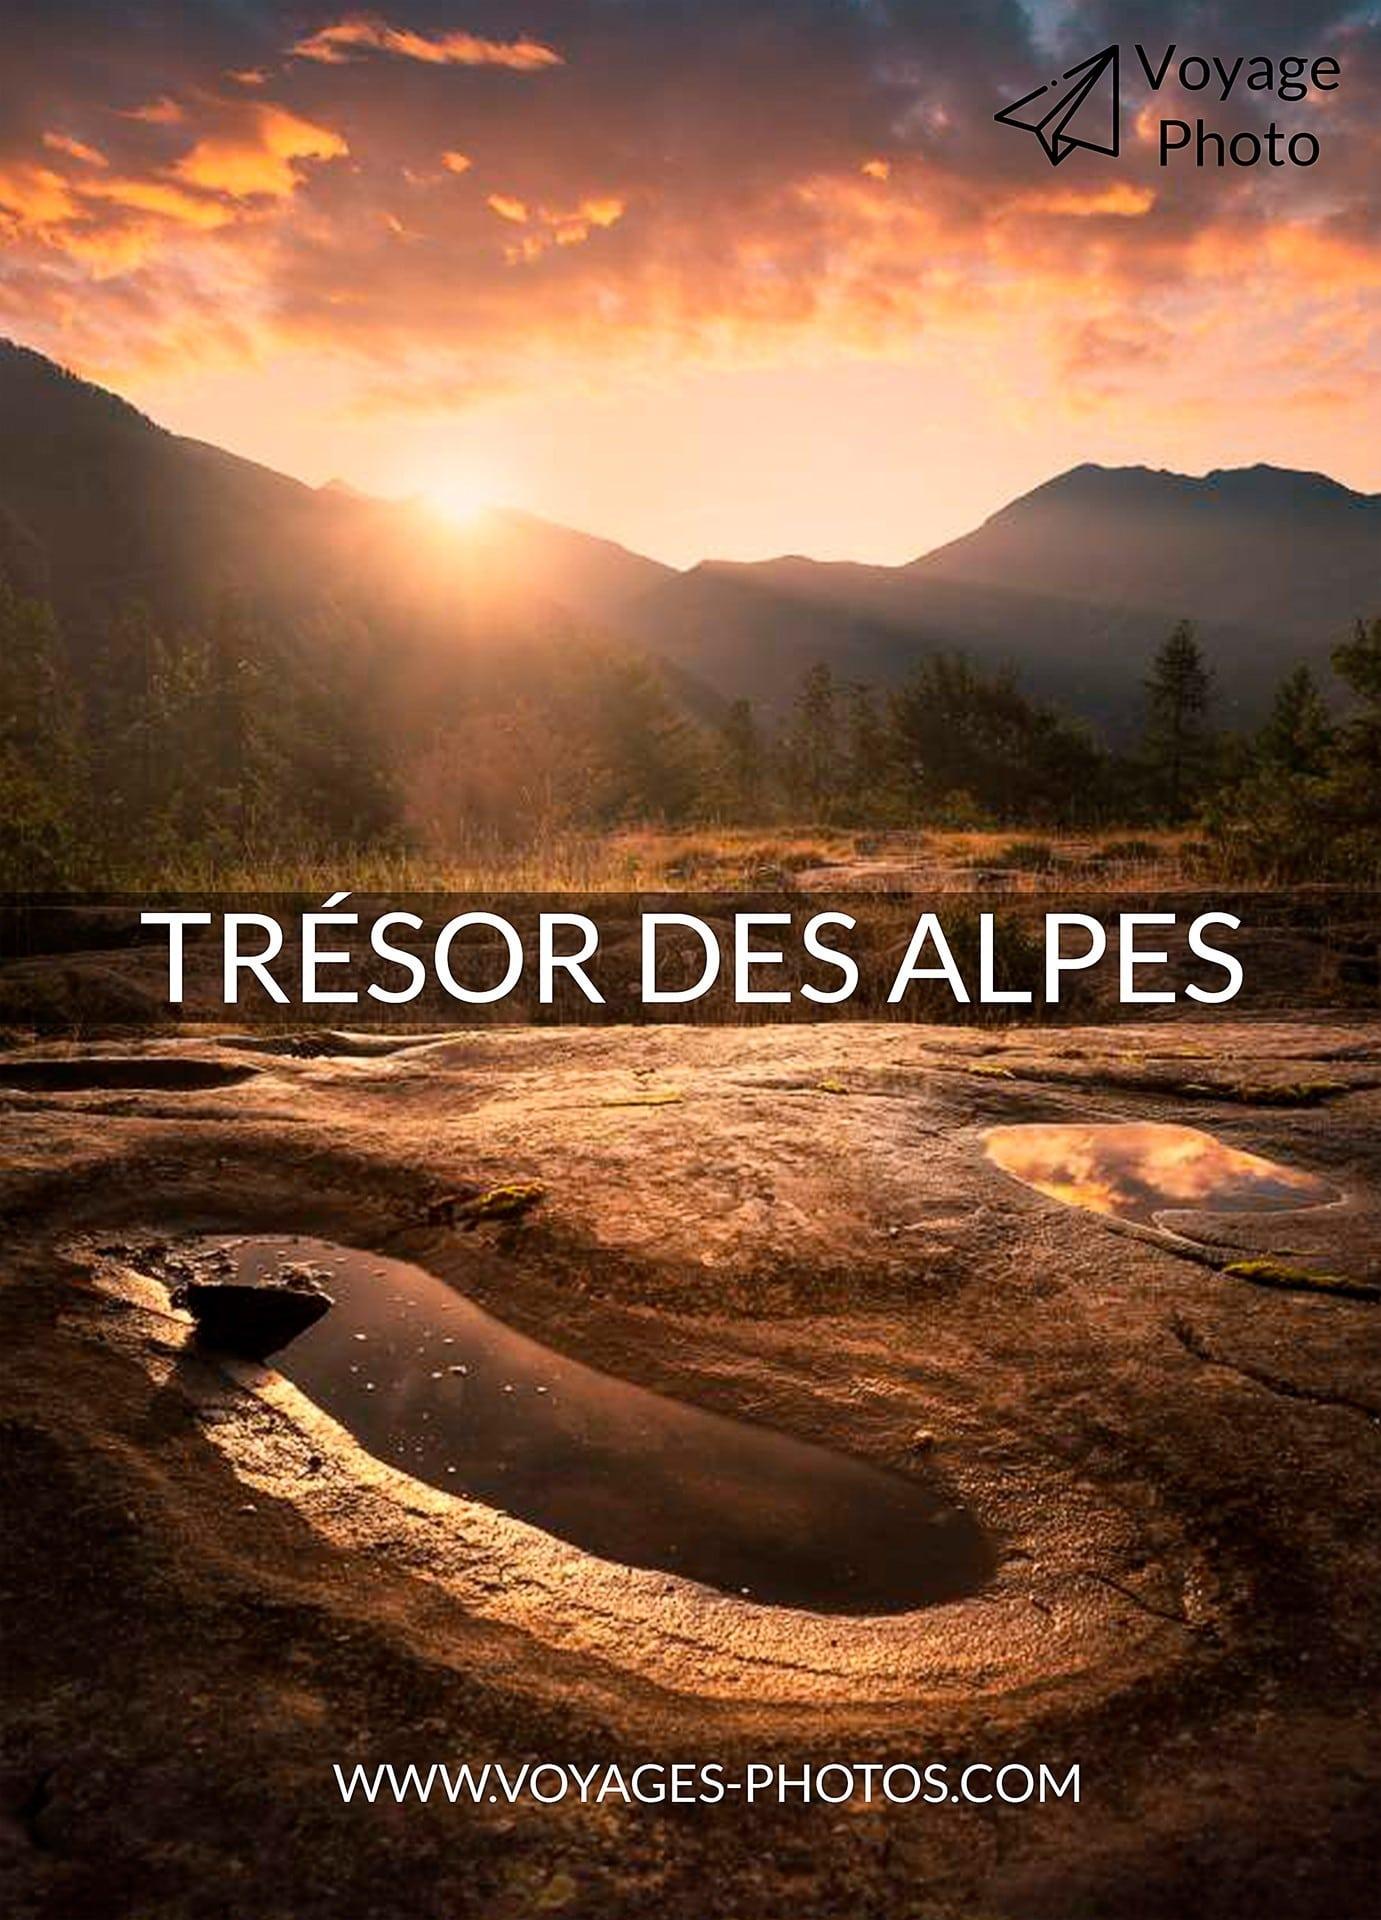 Treasure of the Alps Ecrins Park